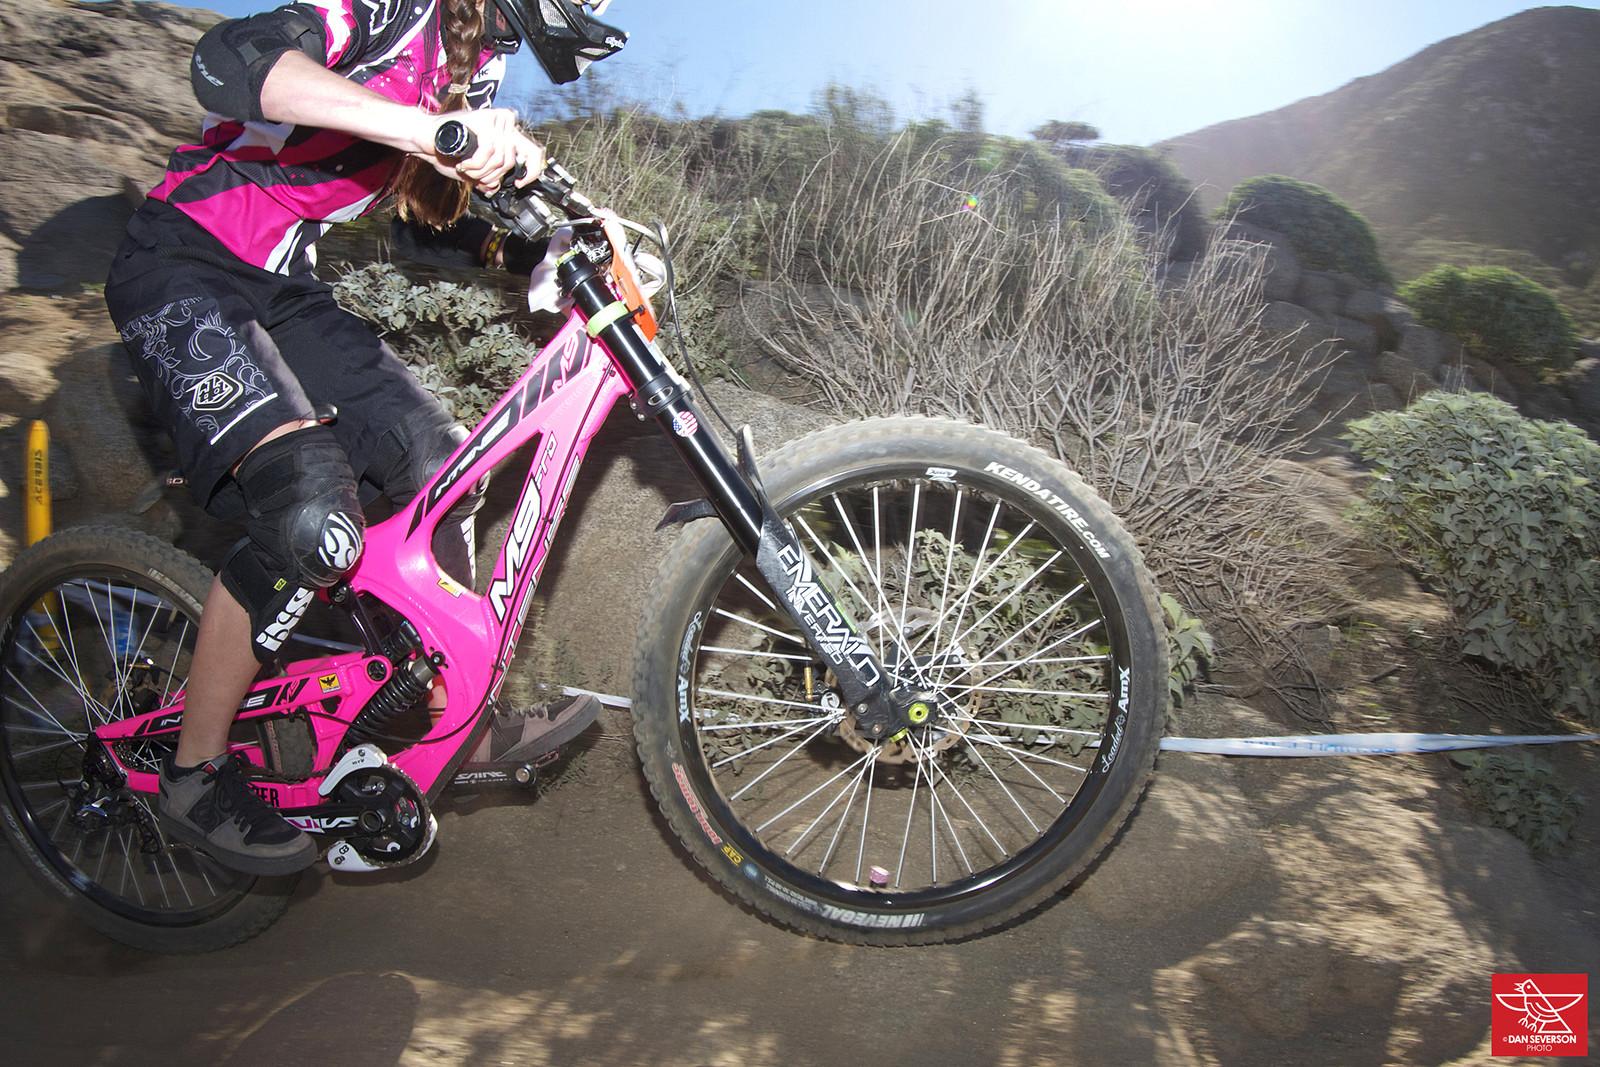 G-Out Project: Fontana 2015 - Intense M9 - danseverson photo - Mountain Biking Pictures - Vital MTB